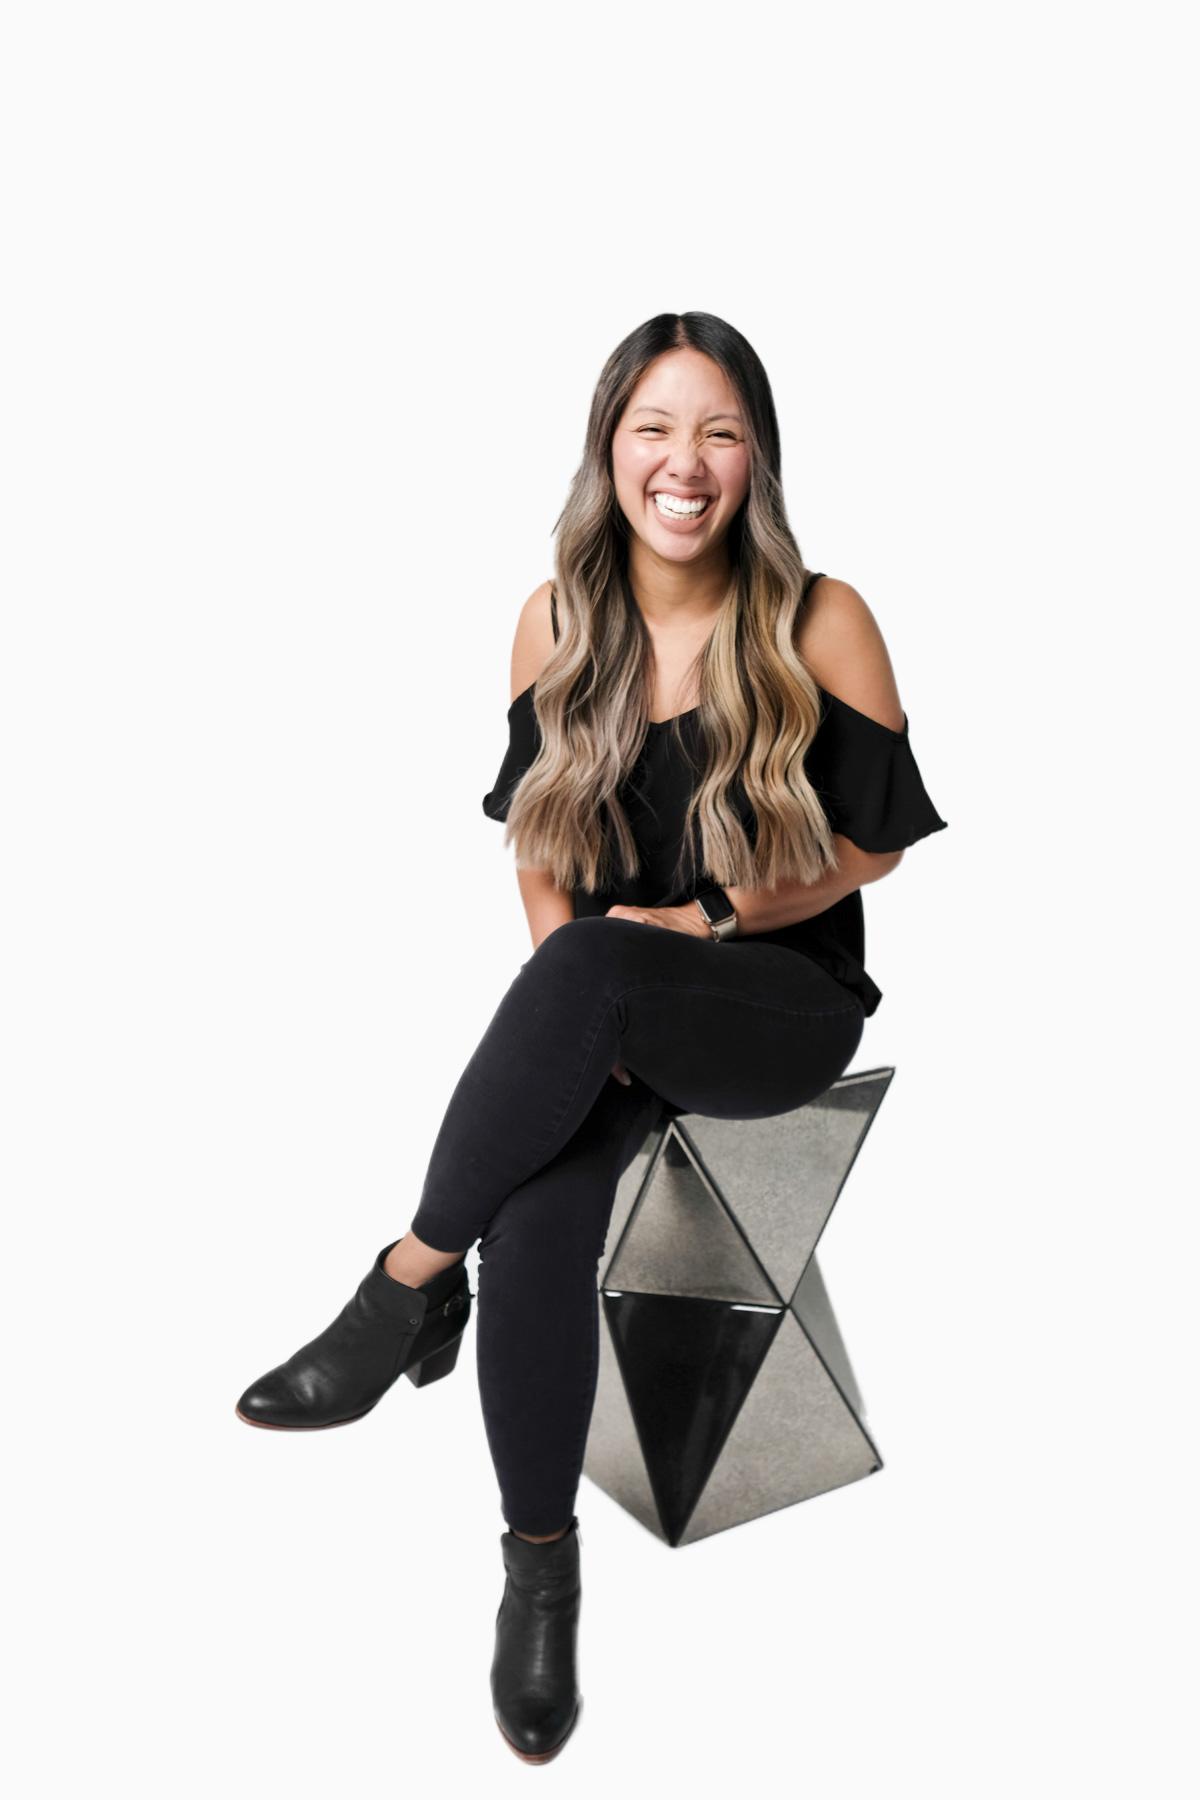 Chrissy Nguyen